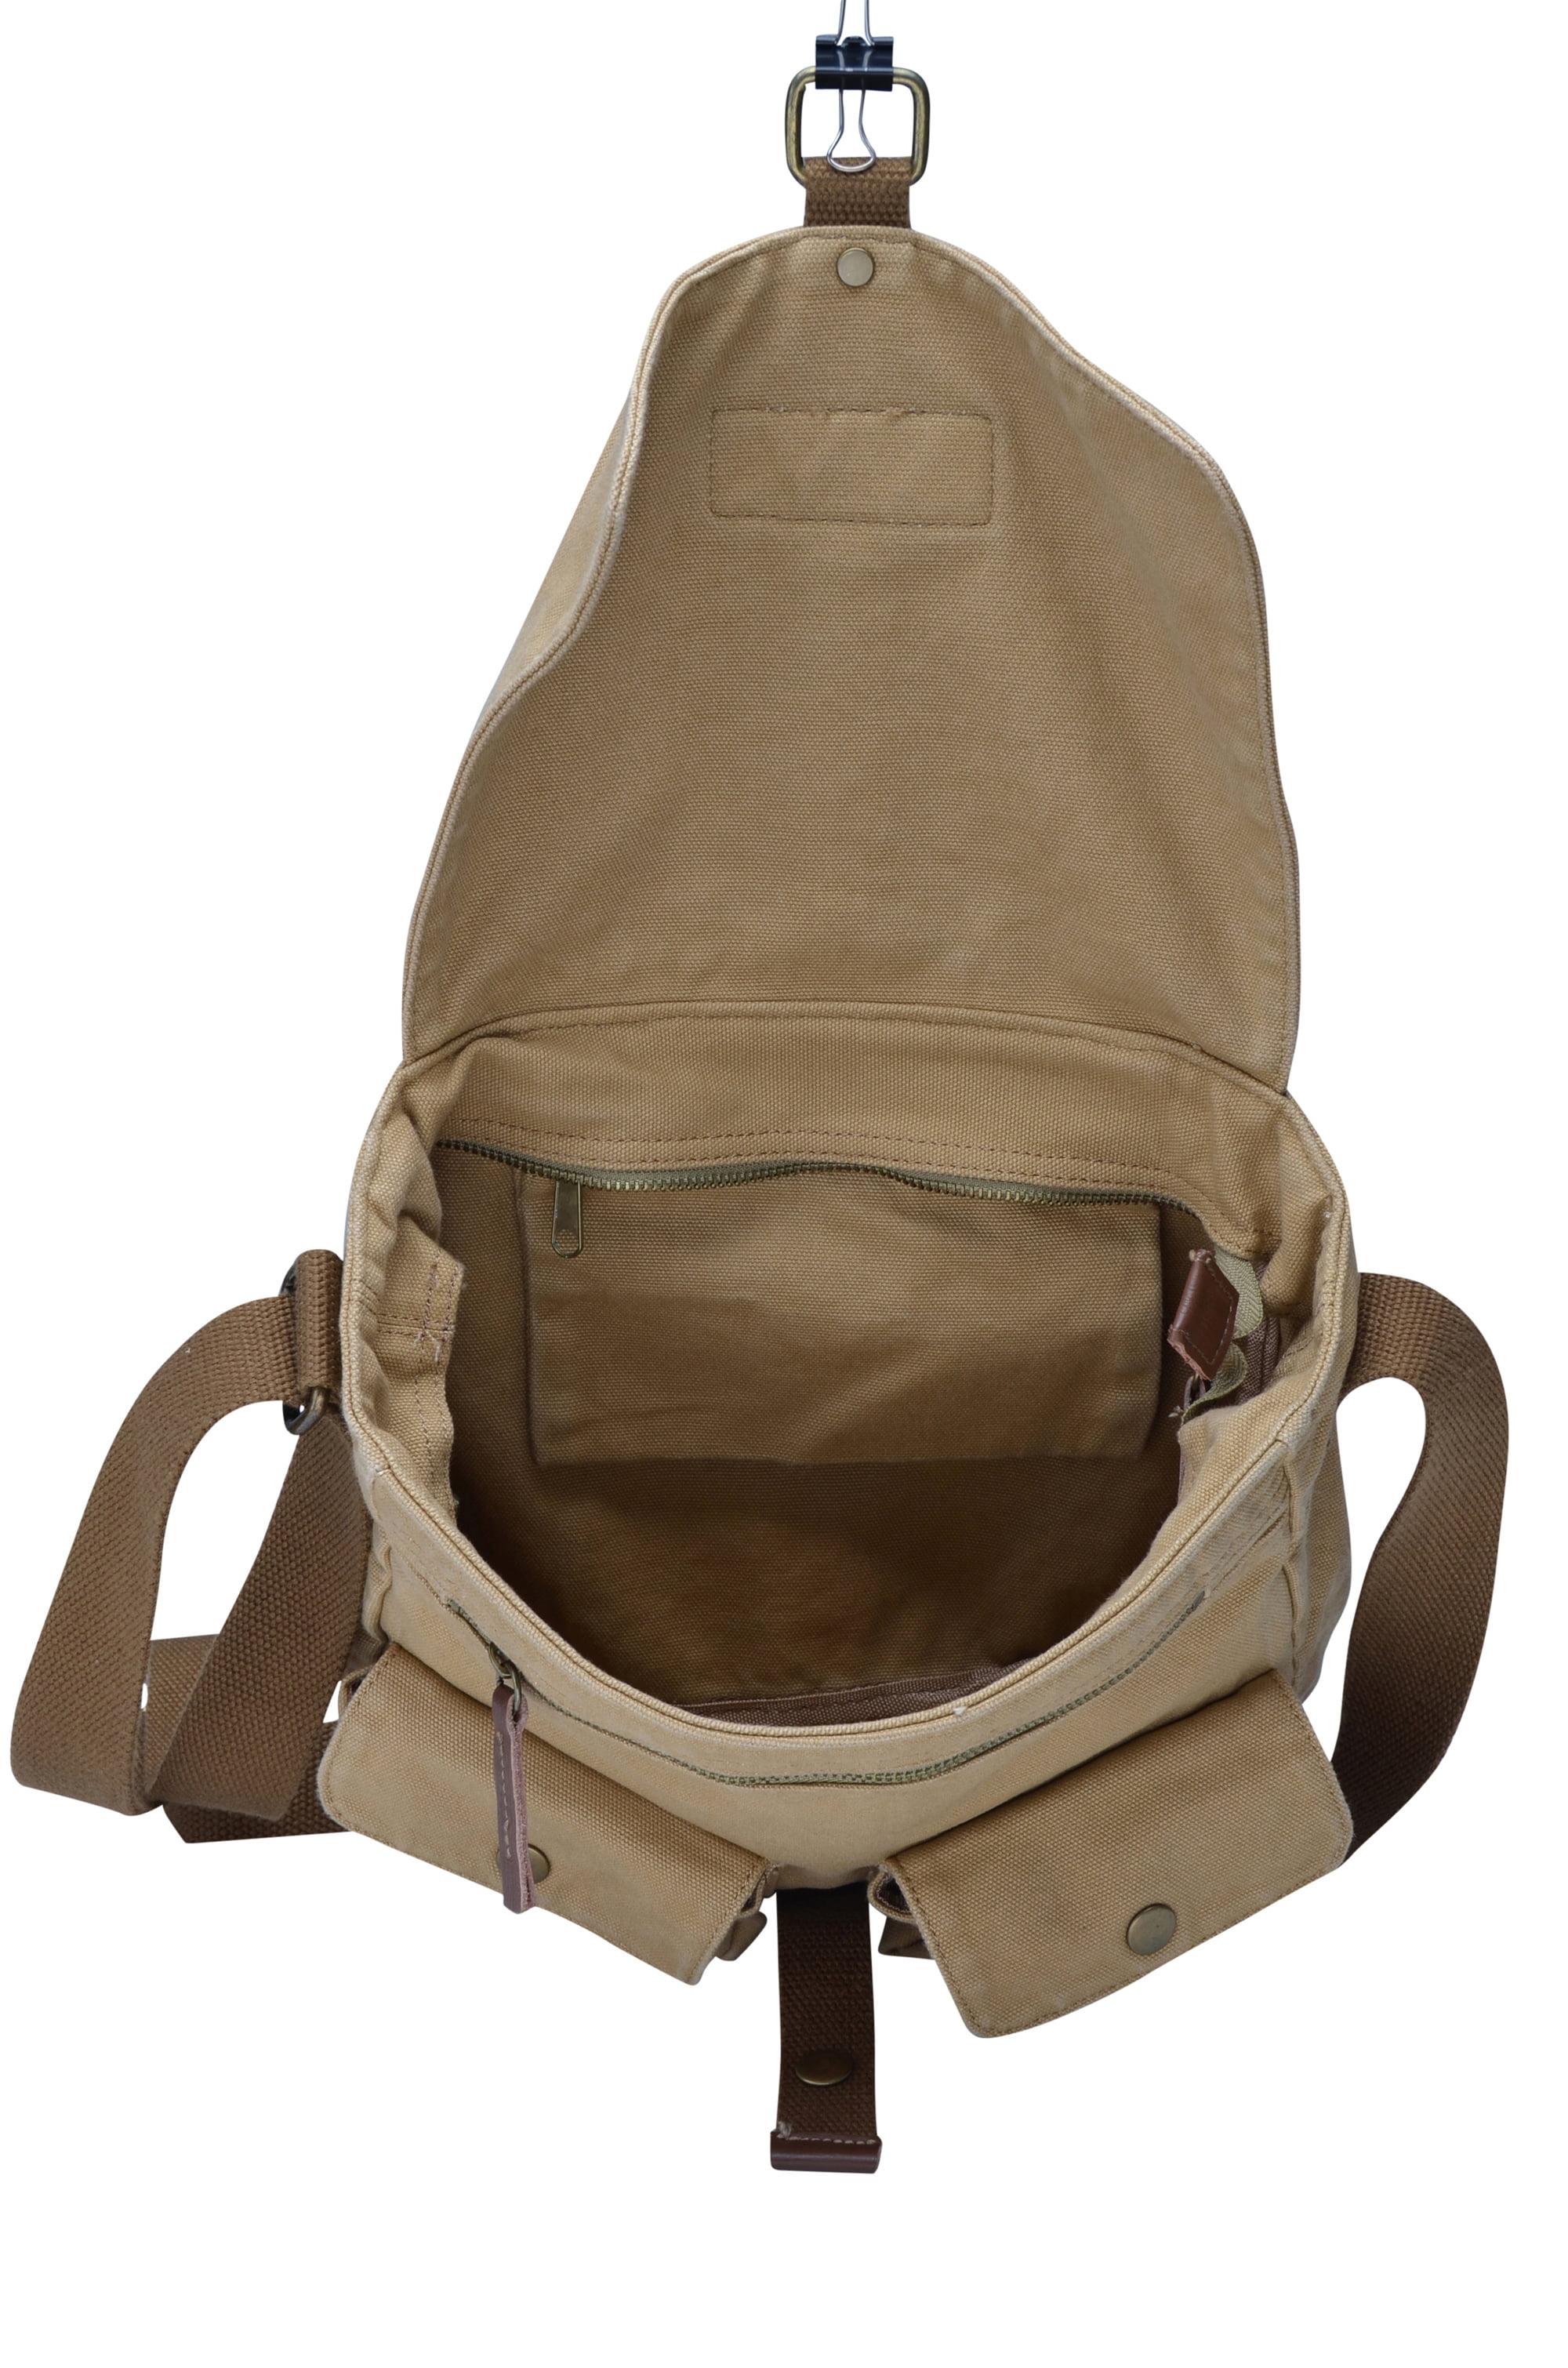 Gootium Vintage Canvas Messenger Bag Men   s Shoulder Bag Cross ...